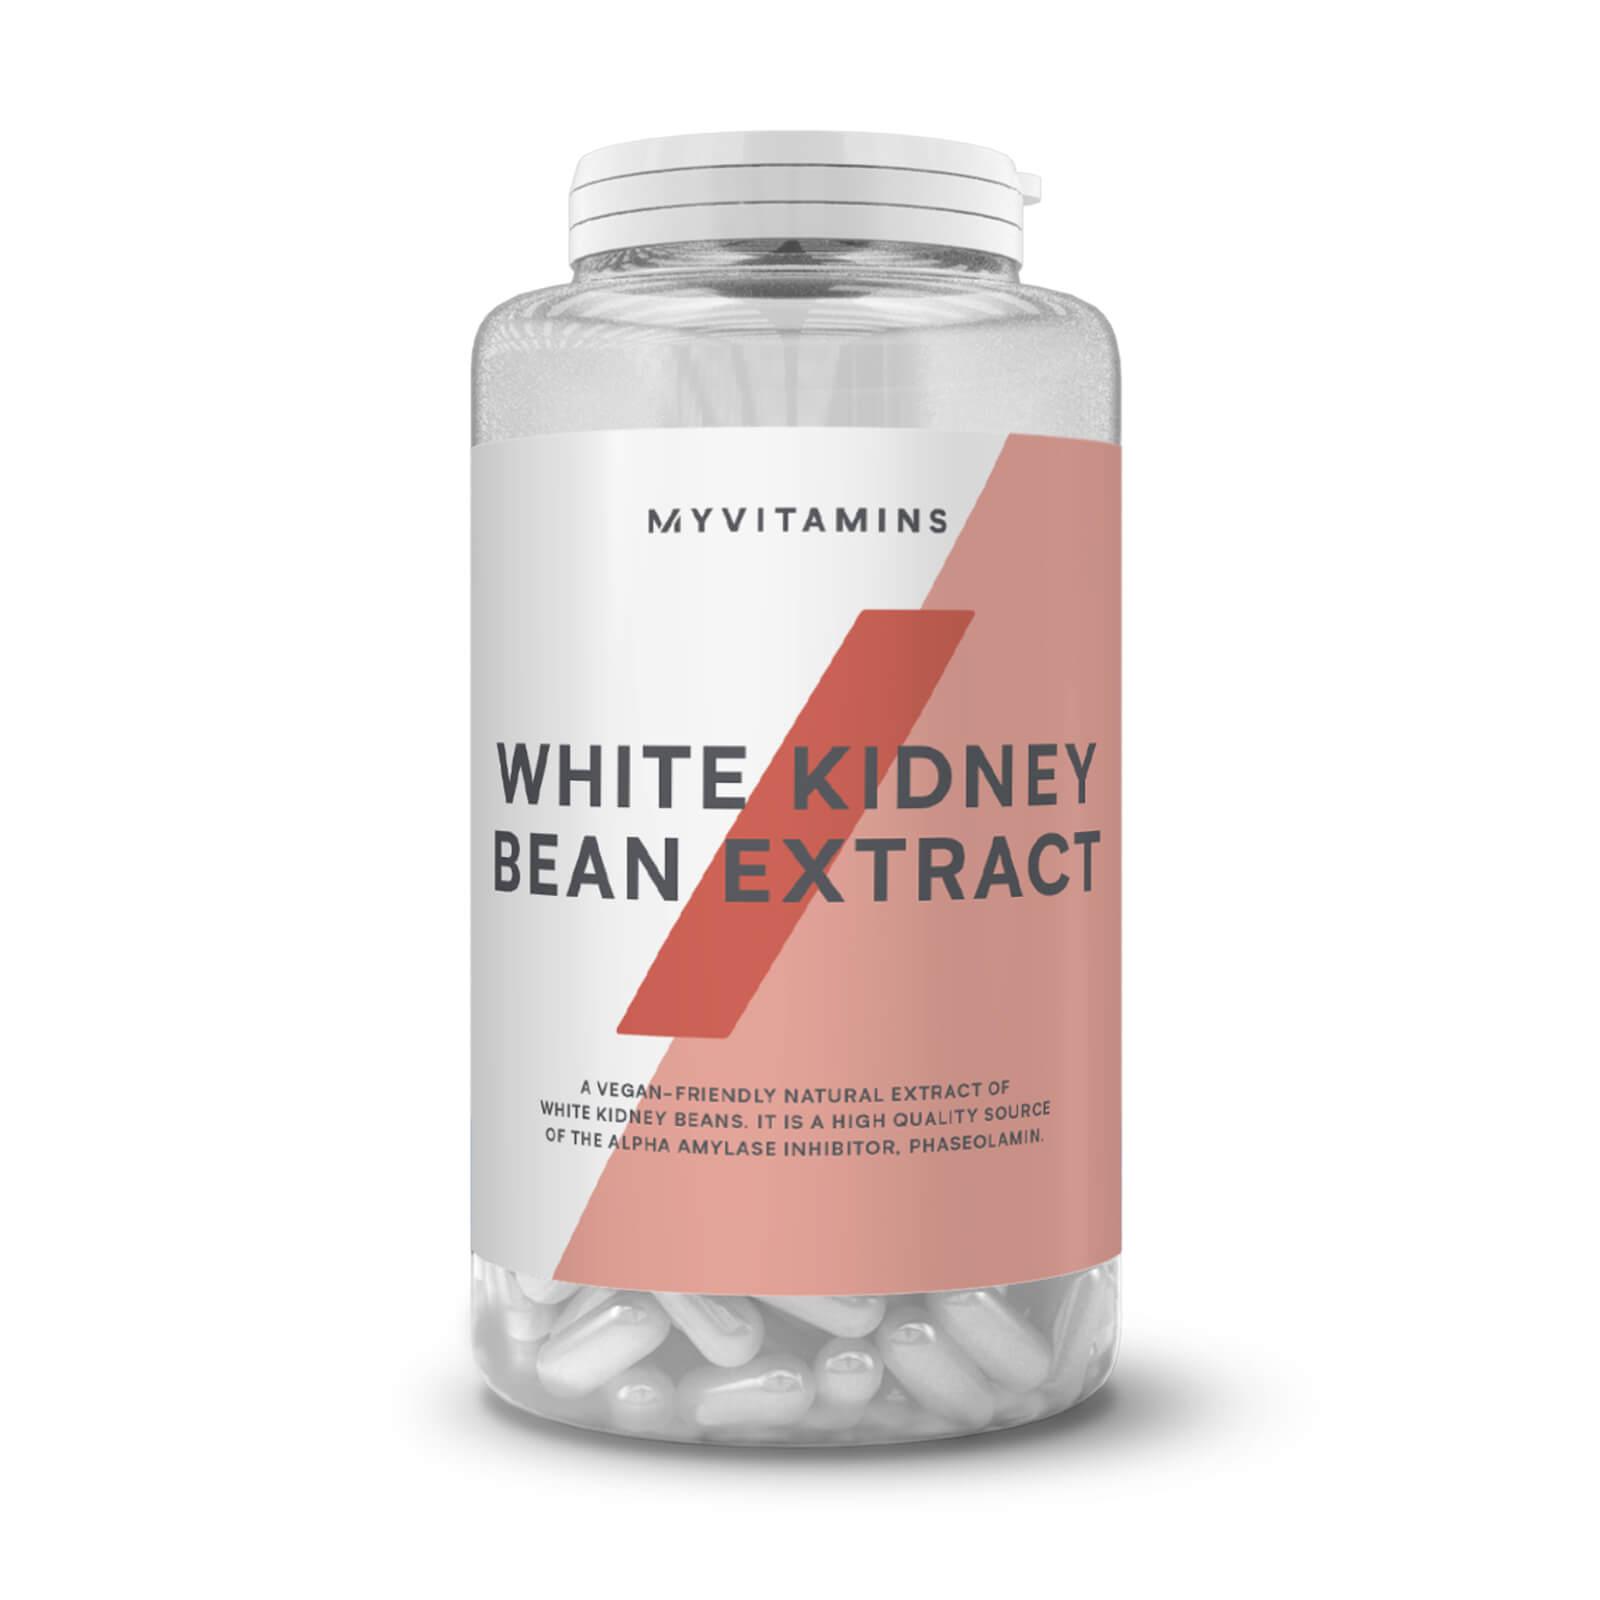 Myvitamins White Kidney Bean Capsules - 60capsules